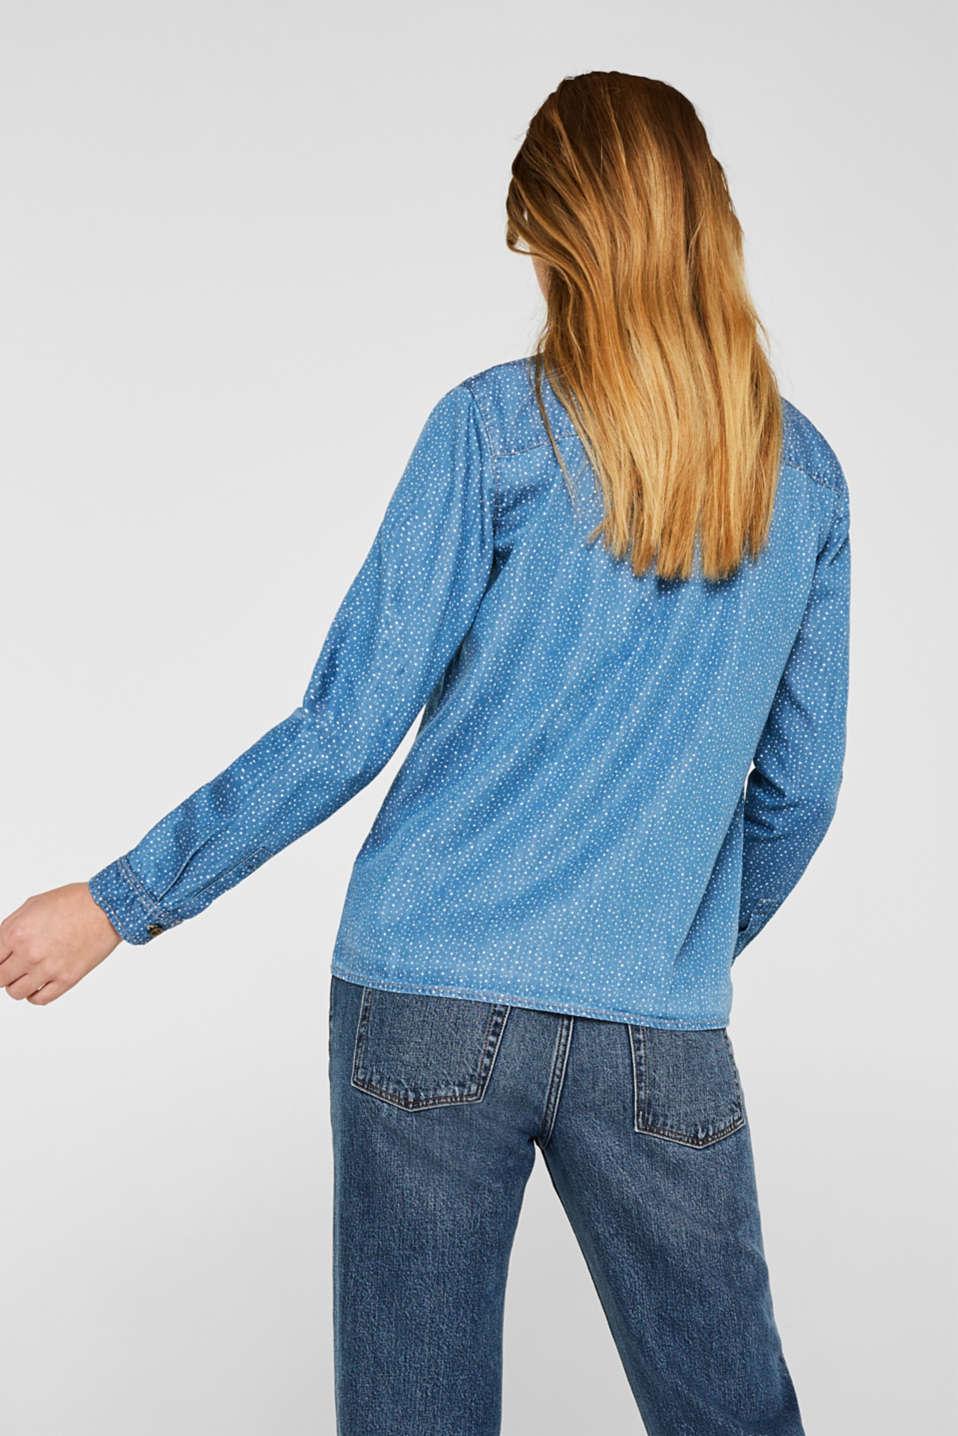 Printed denim blouse, 100% cotton, BLUE LIGHT WASH, detail image number 3